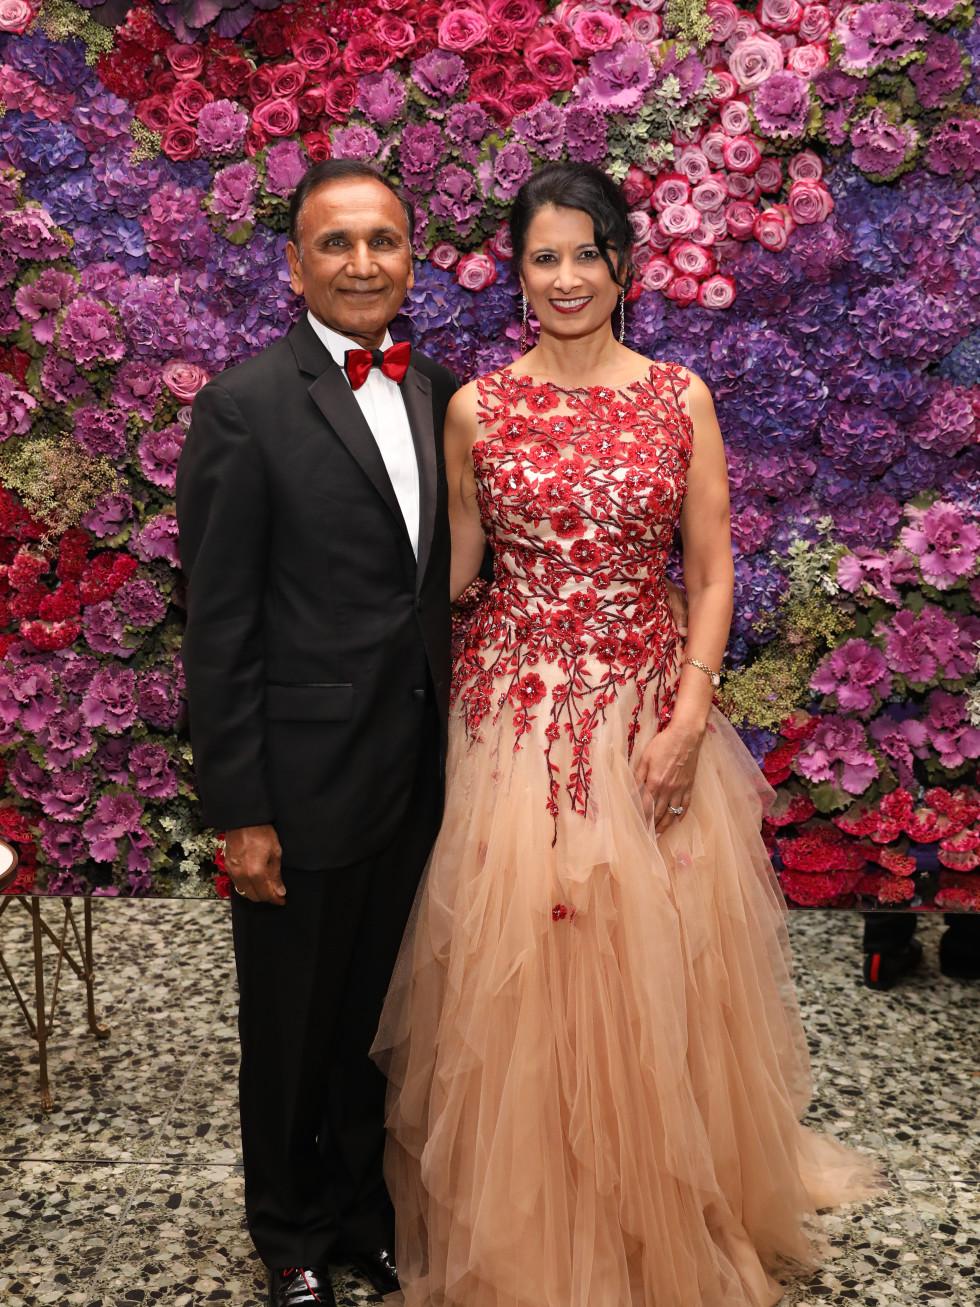 Suresh and Renu Khator at MFAH Grand Gala Ball